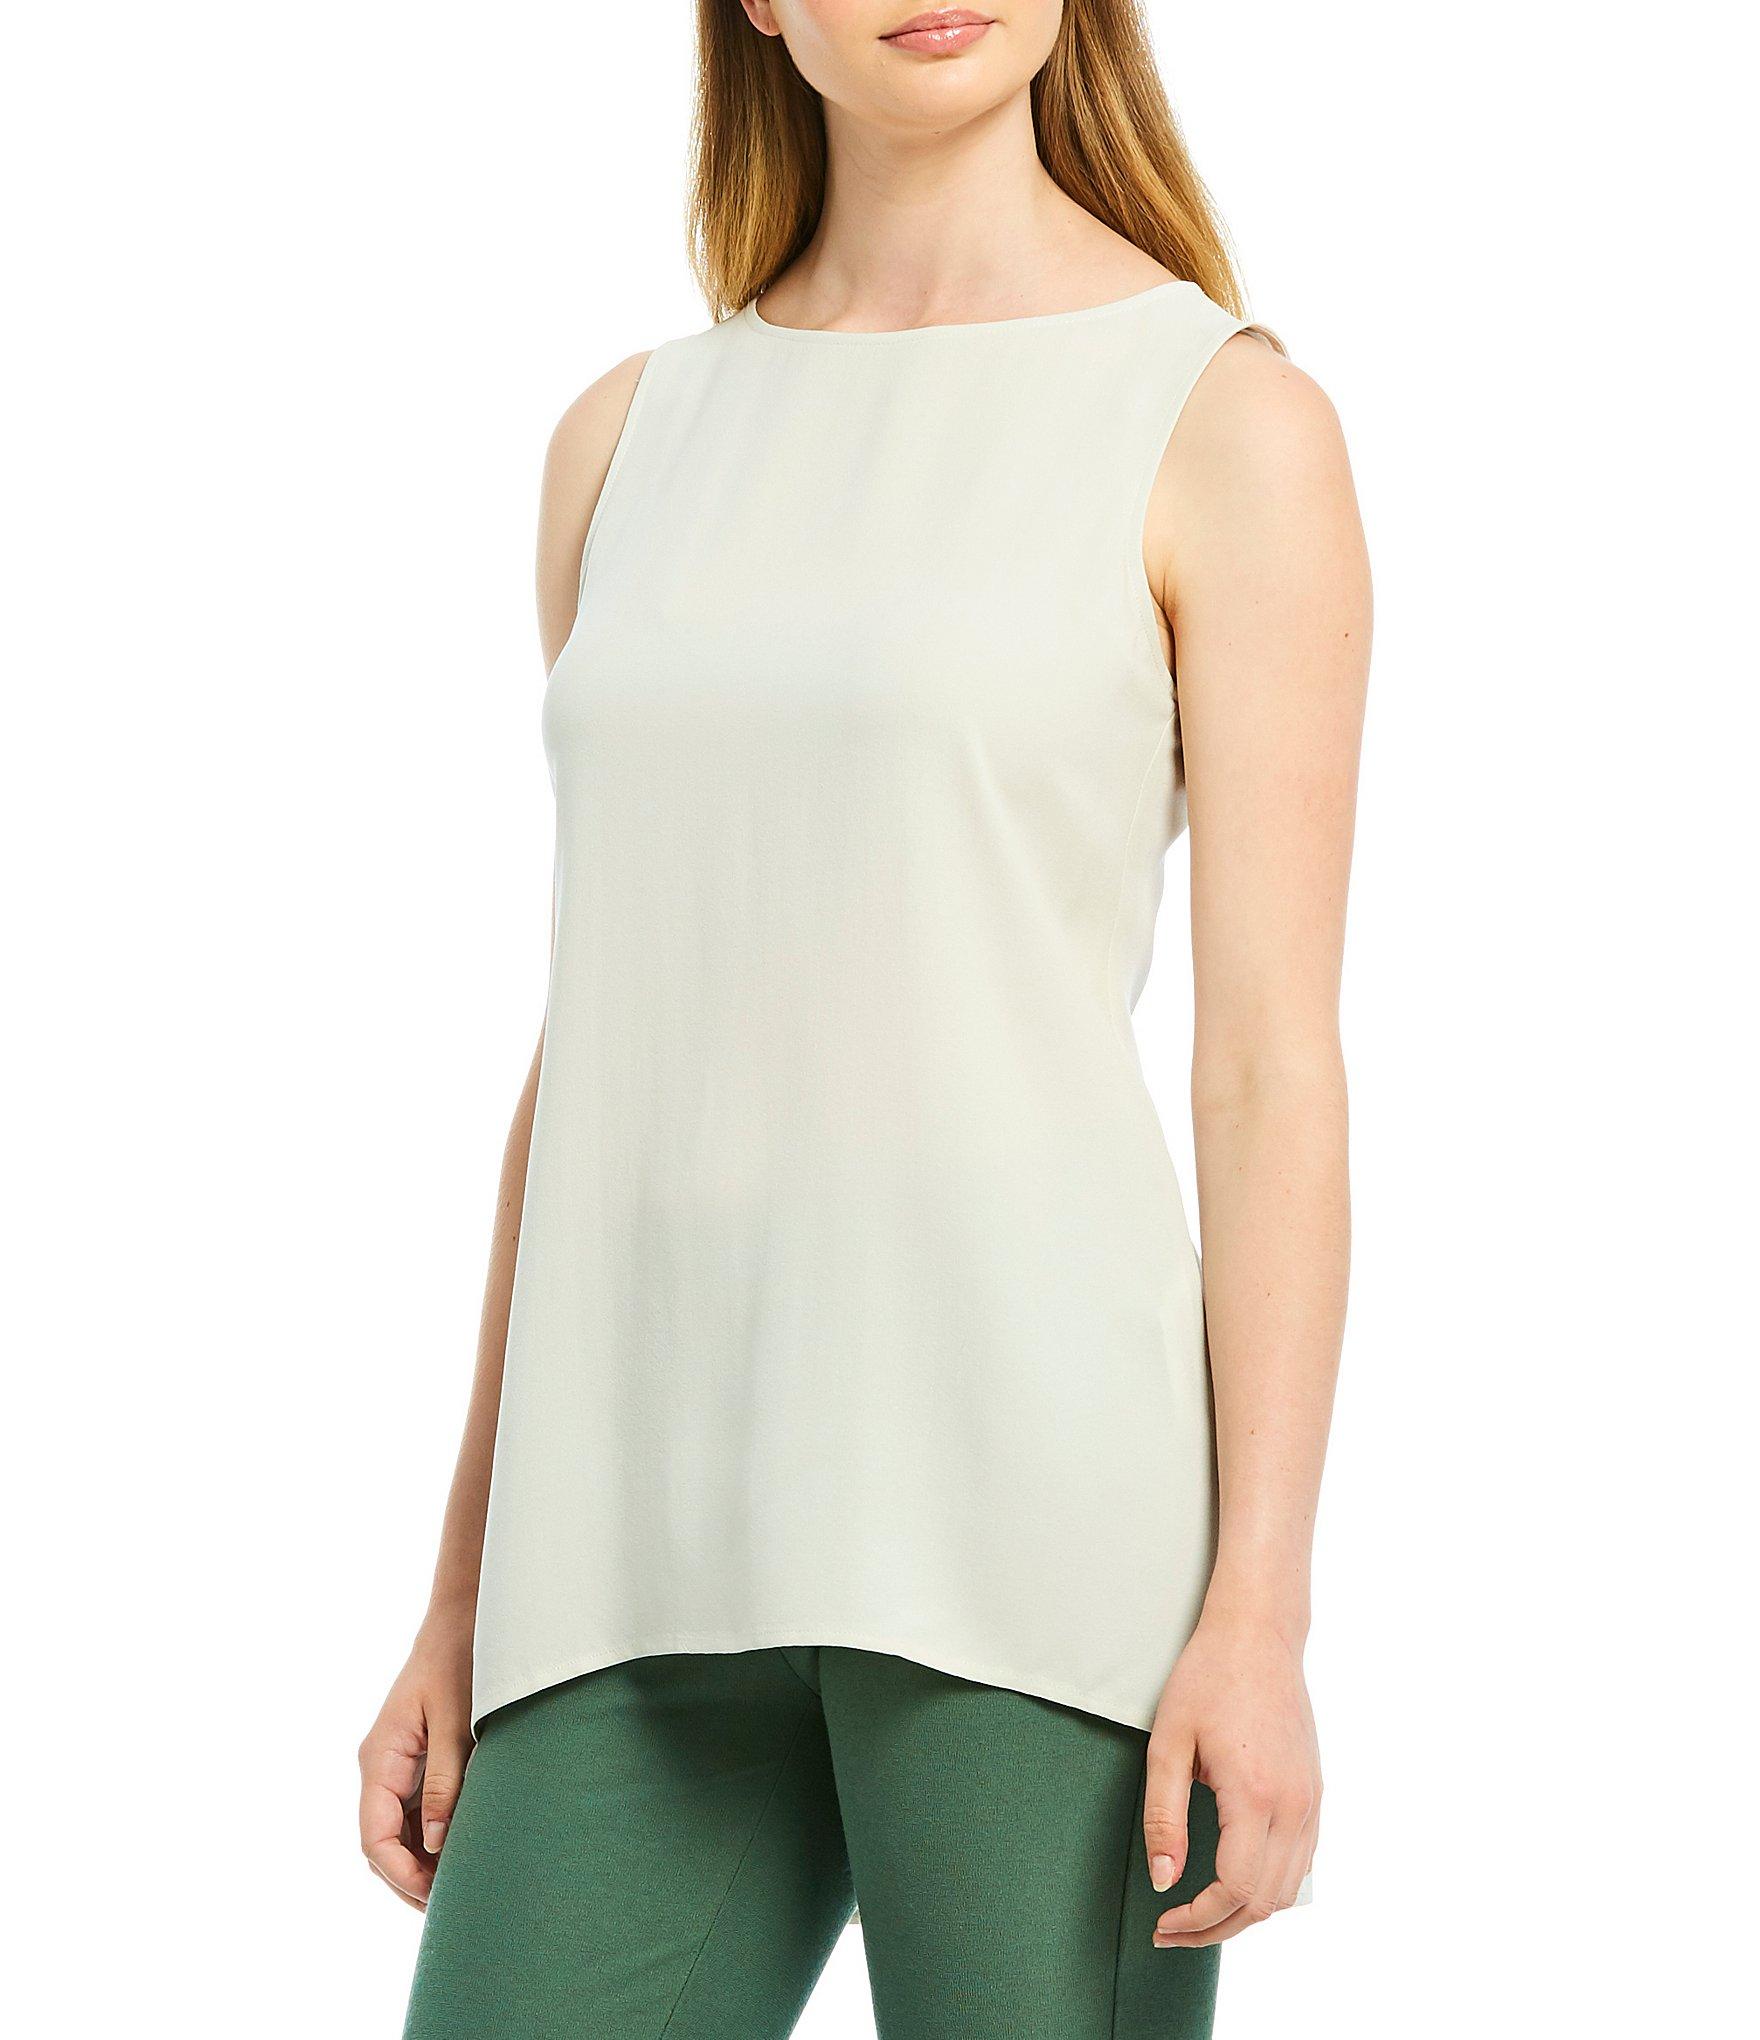 Shirt for Women On Sale, White, Silk, 2017, 10 12 14 6 8 Her Shirt